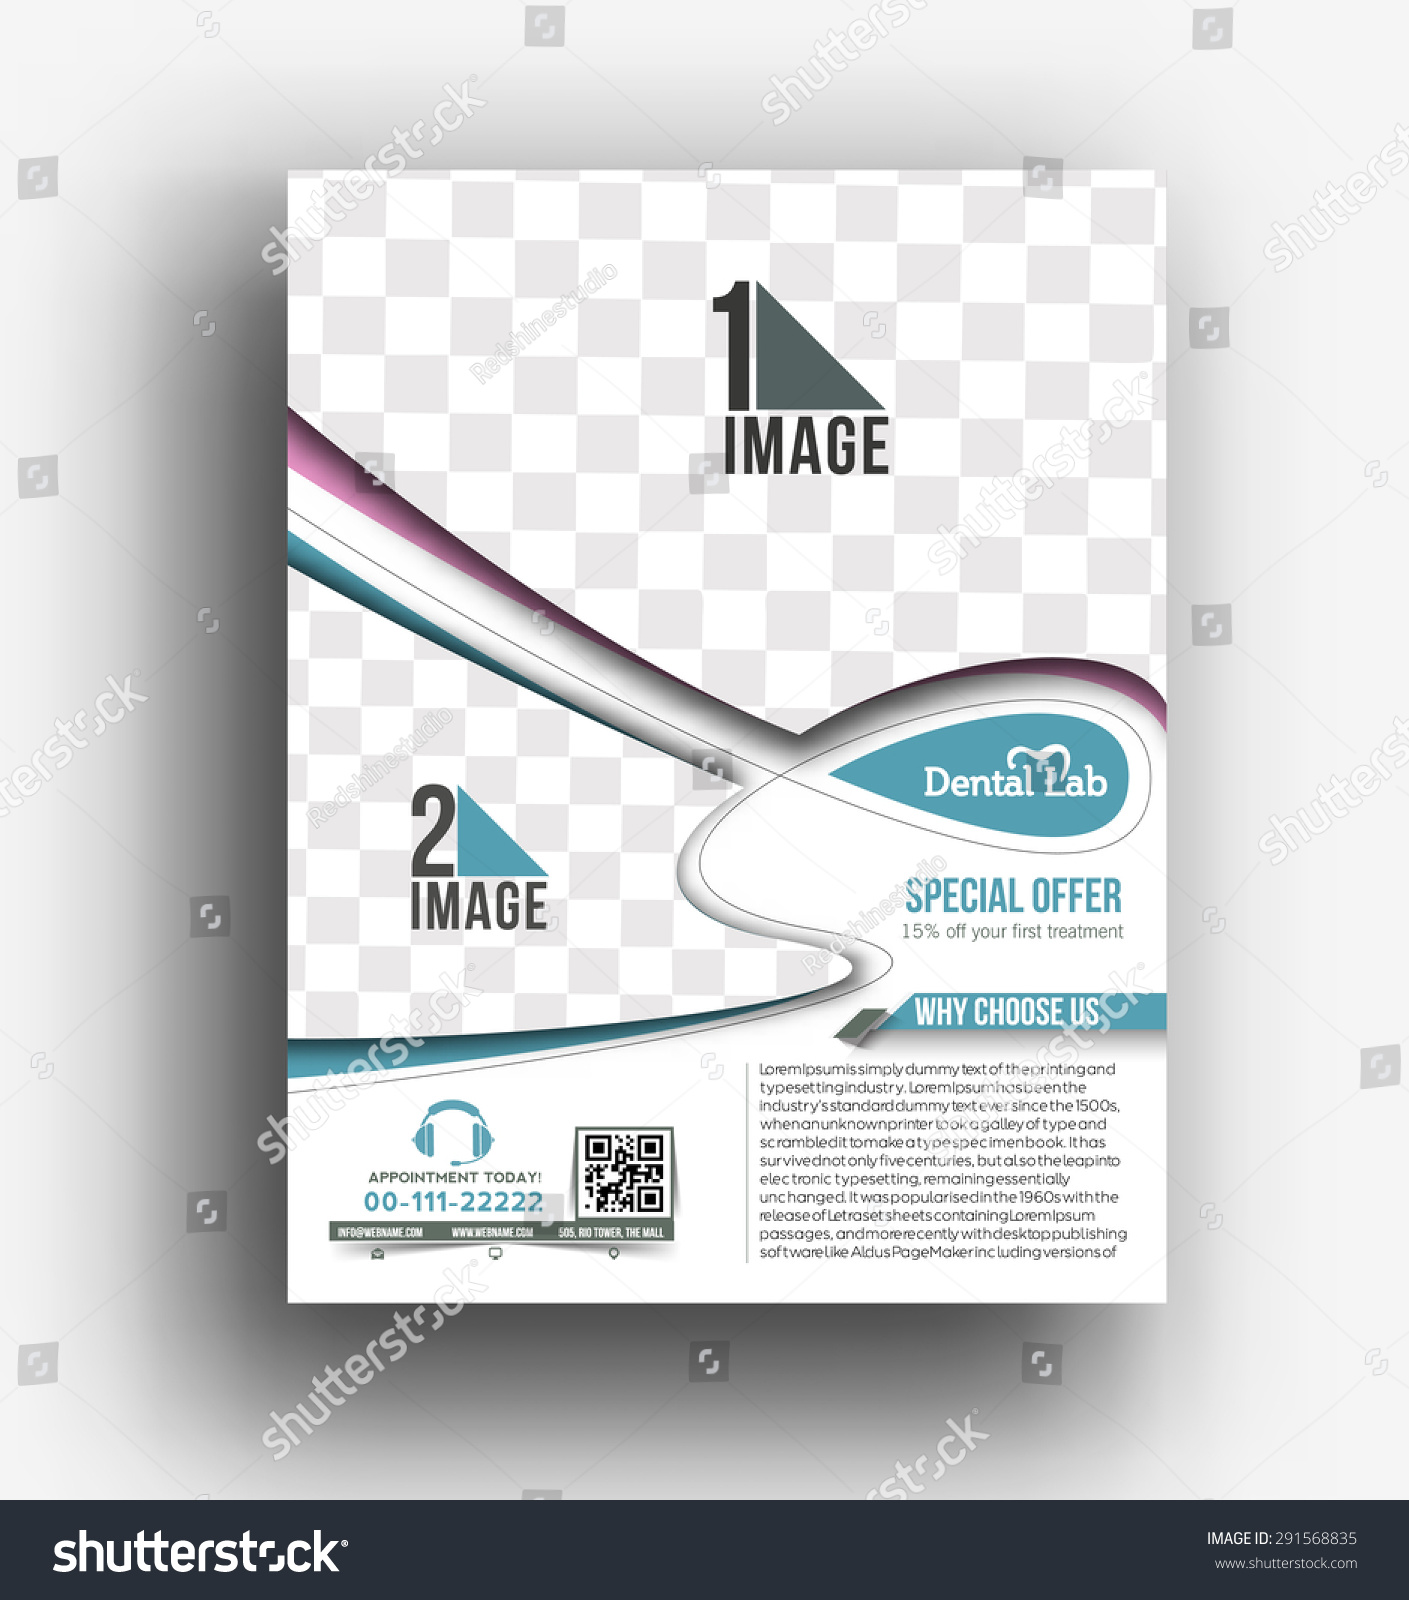 Dental lab front flyer poster template stock vector for Dental lab design layout